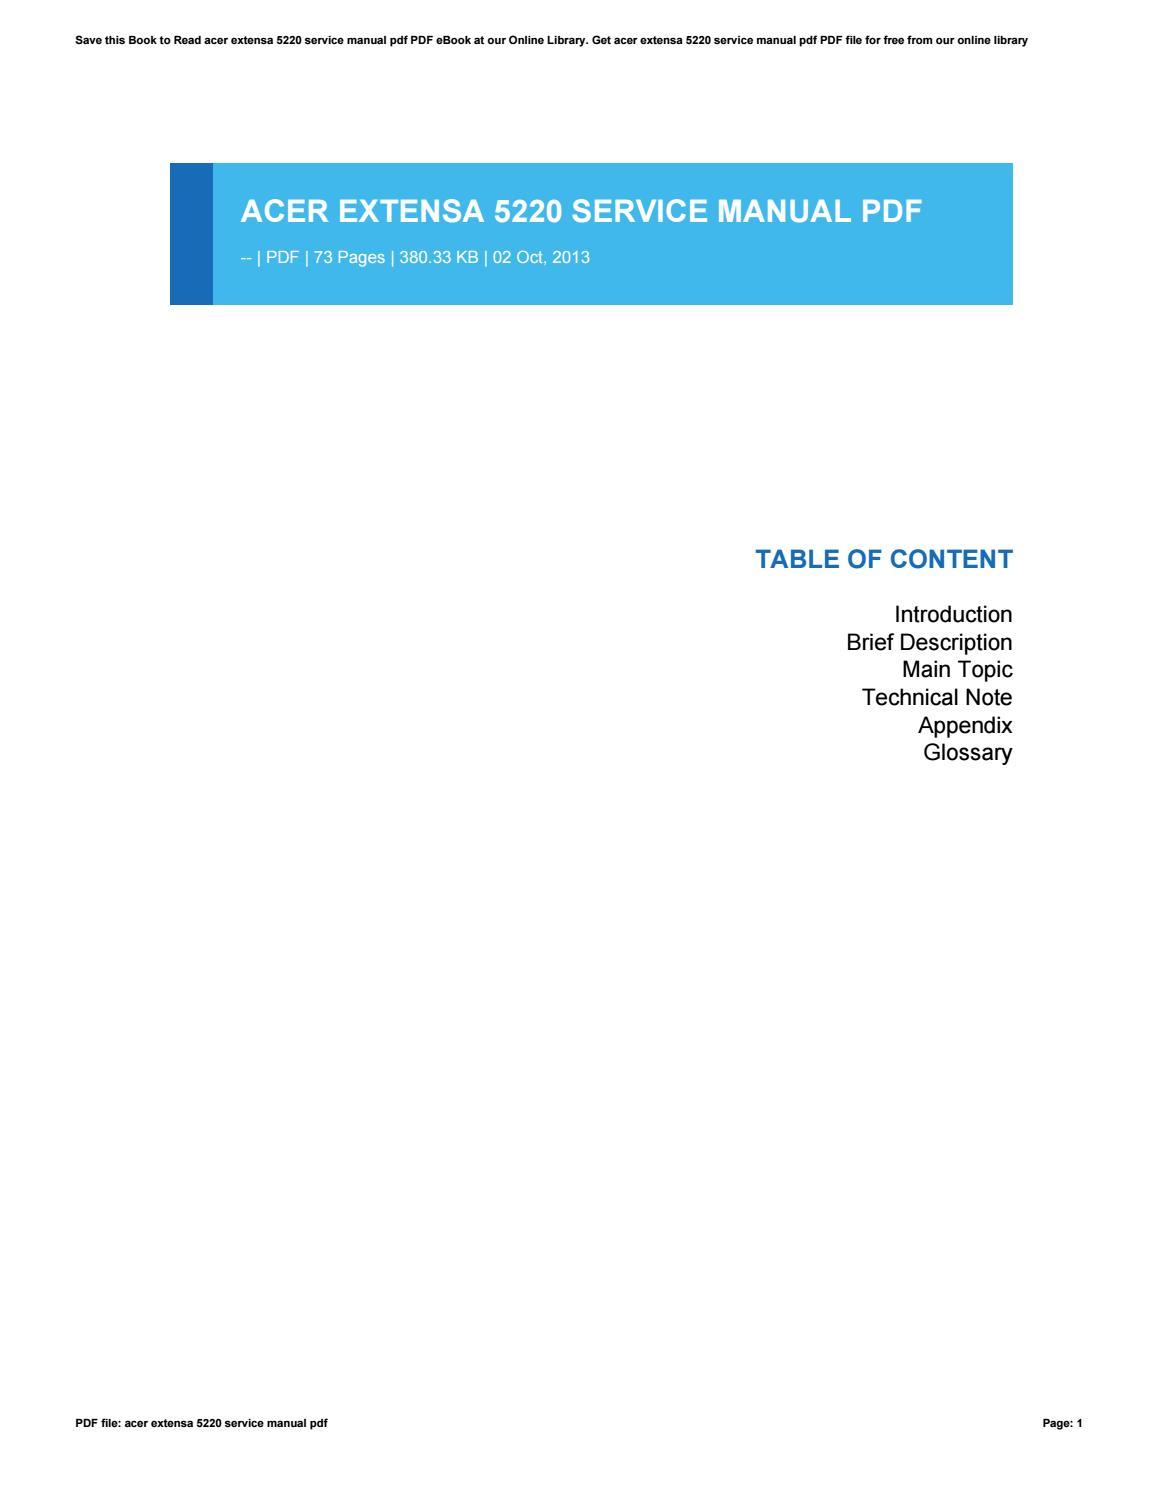 acer extensa 5220 service manual pdf by w815 issuu rh issuu com acer extensa 7220 service manual acer extensa 5620z service manual